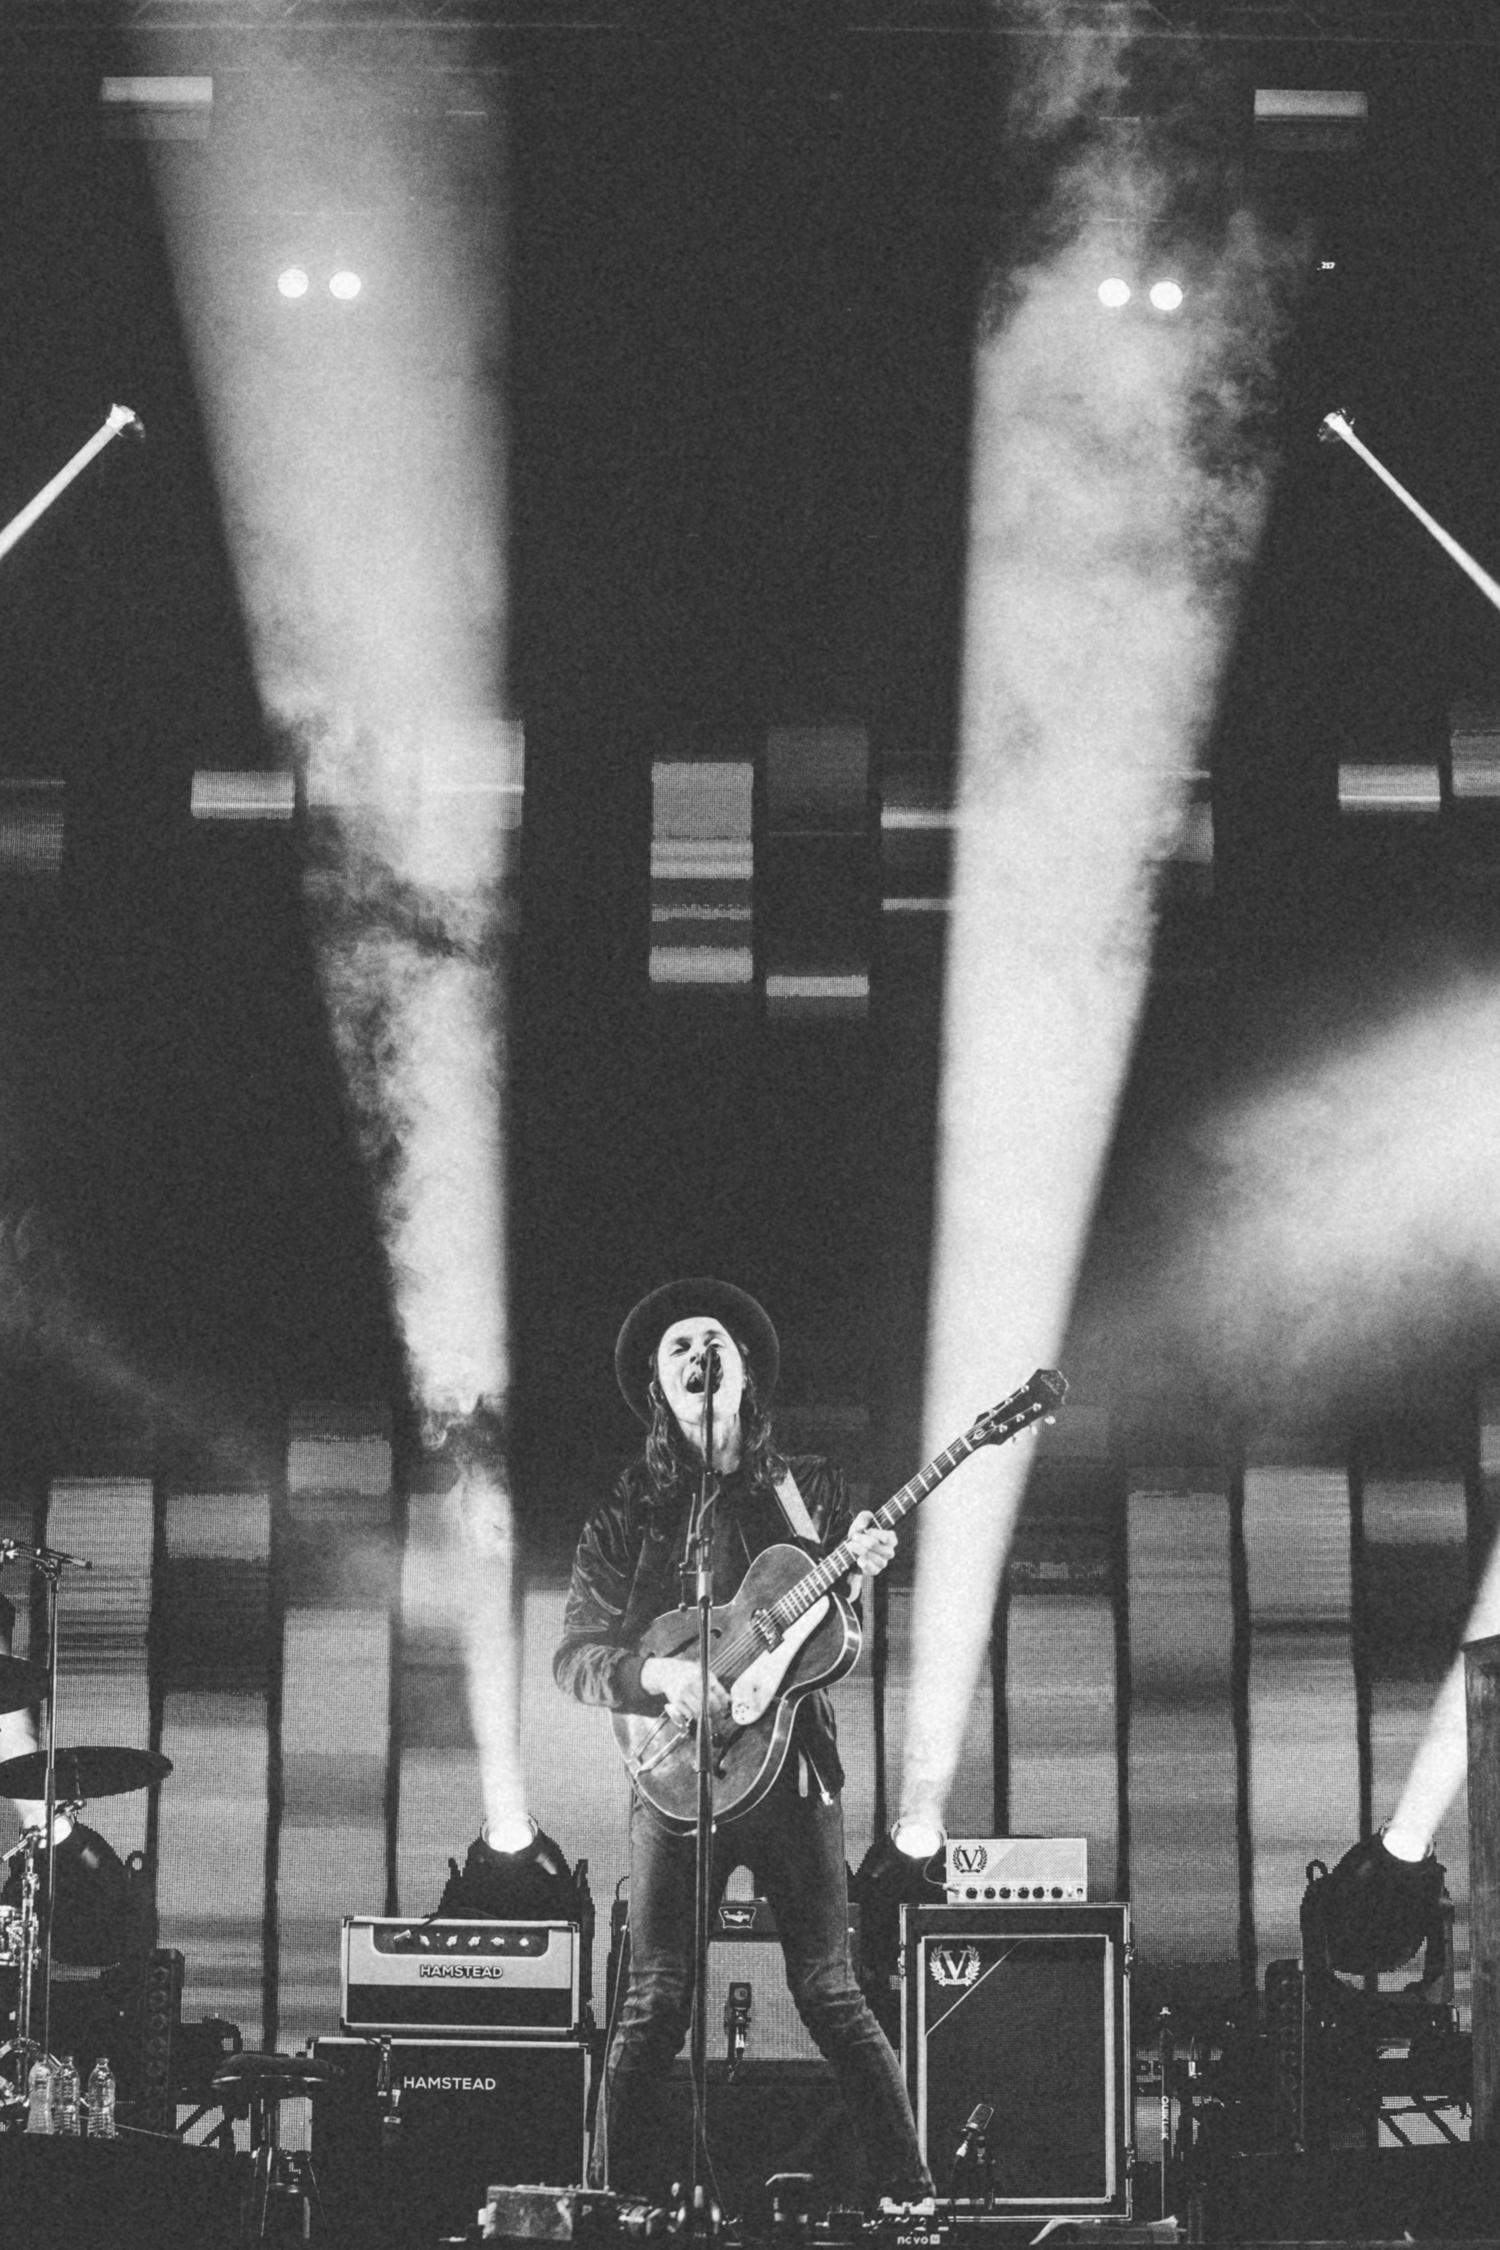 James-Bay-Live-Boardmasters-Music-Concert-Darina-Stoda-Photography-Photographer-19.jpg